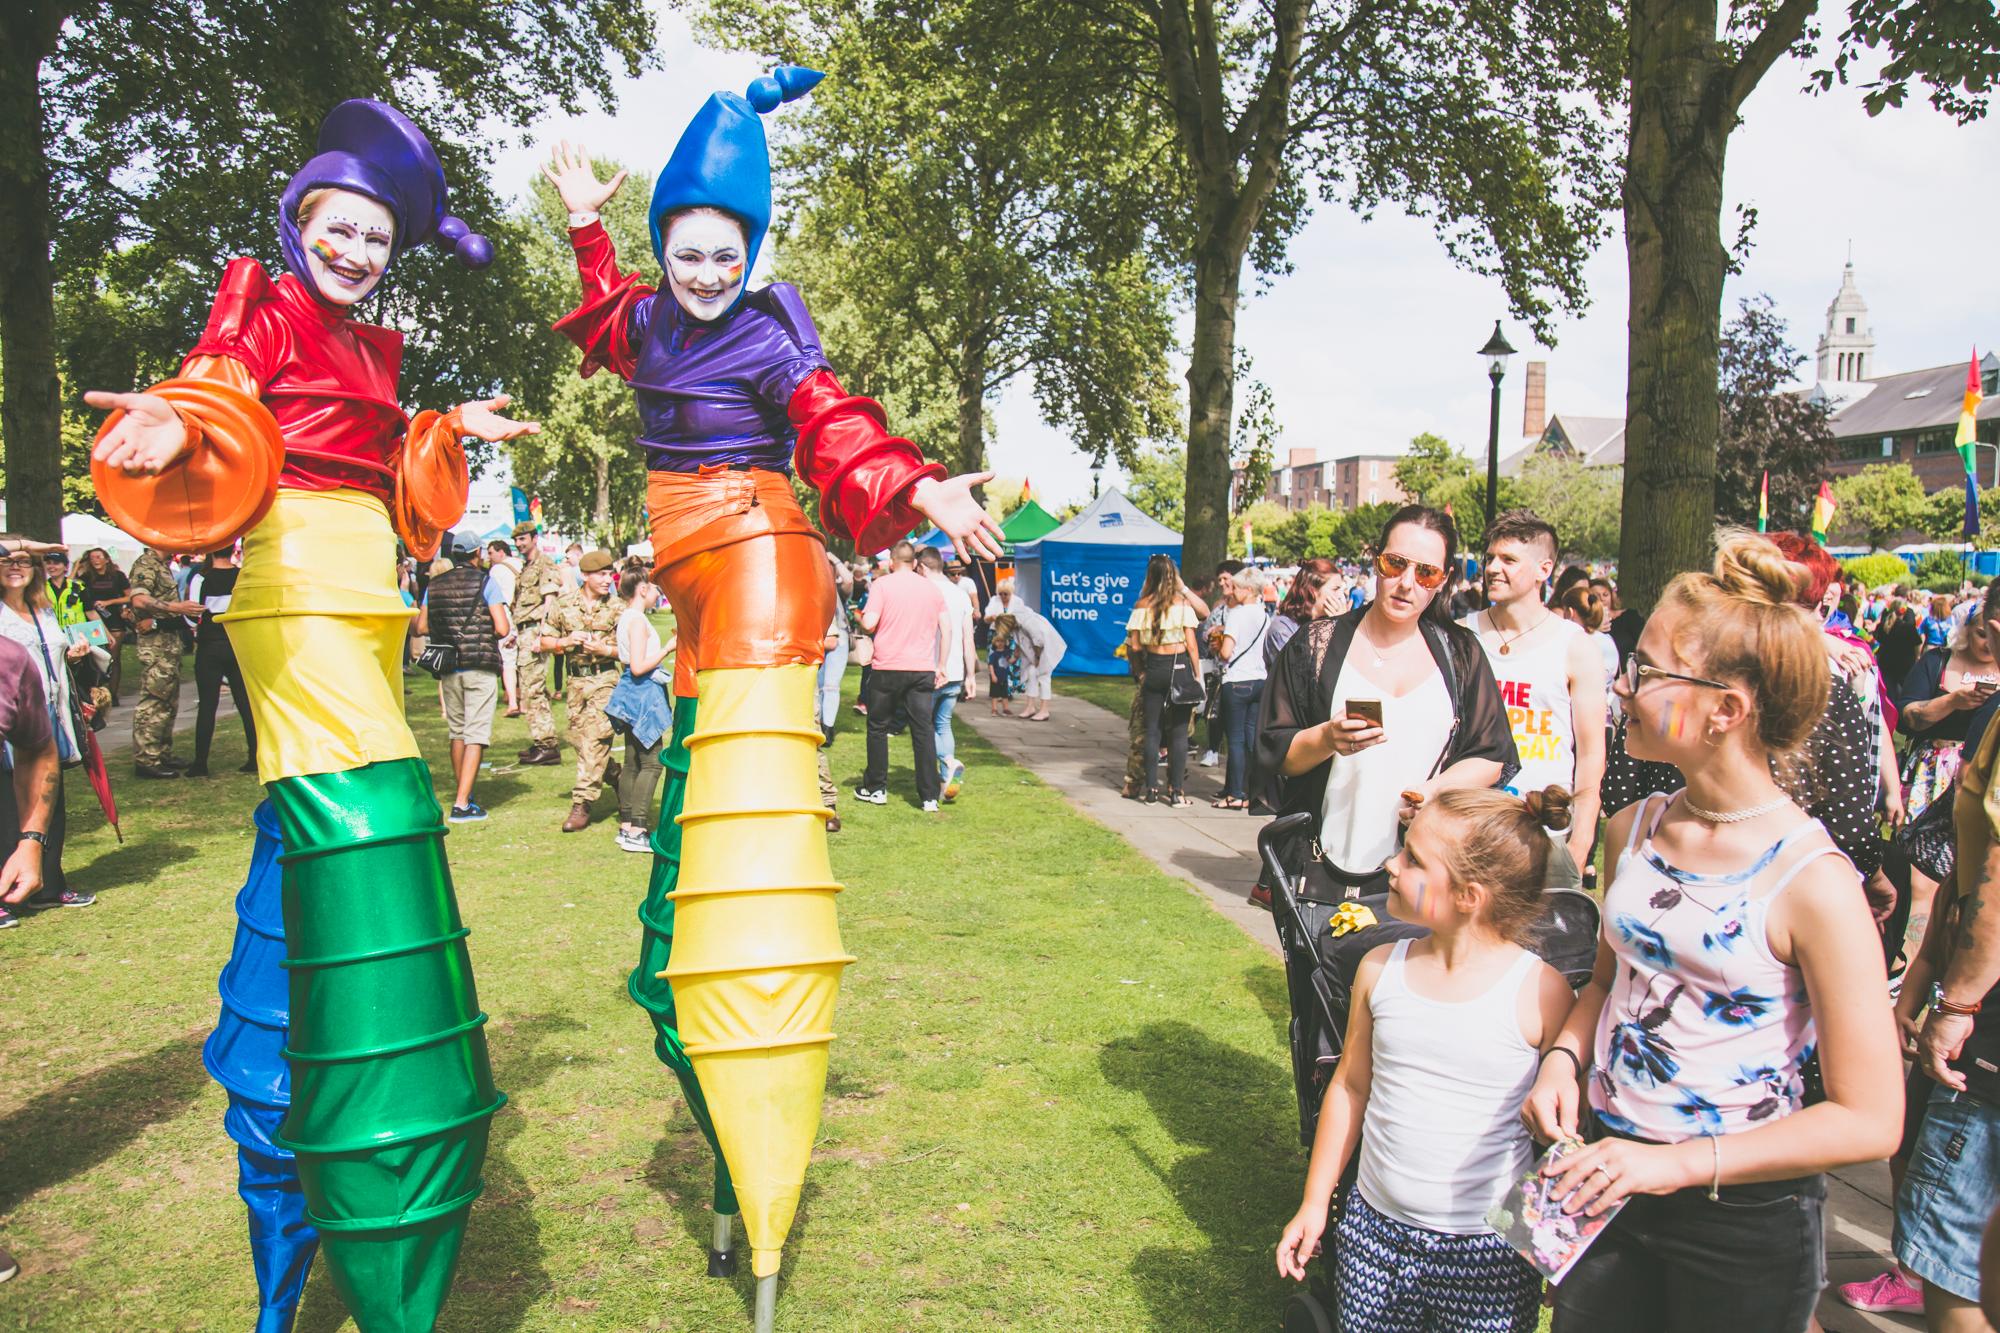 Rainbow stilt walkers at hull pride